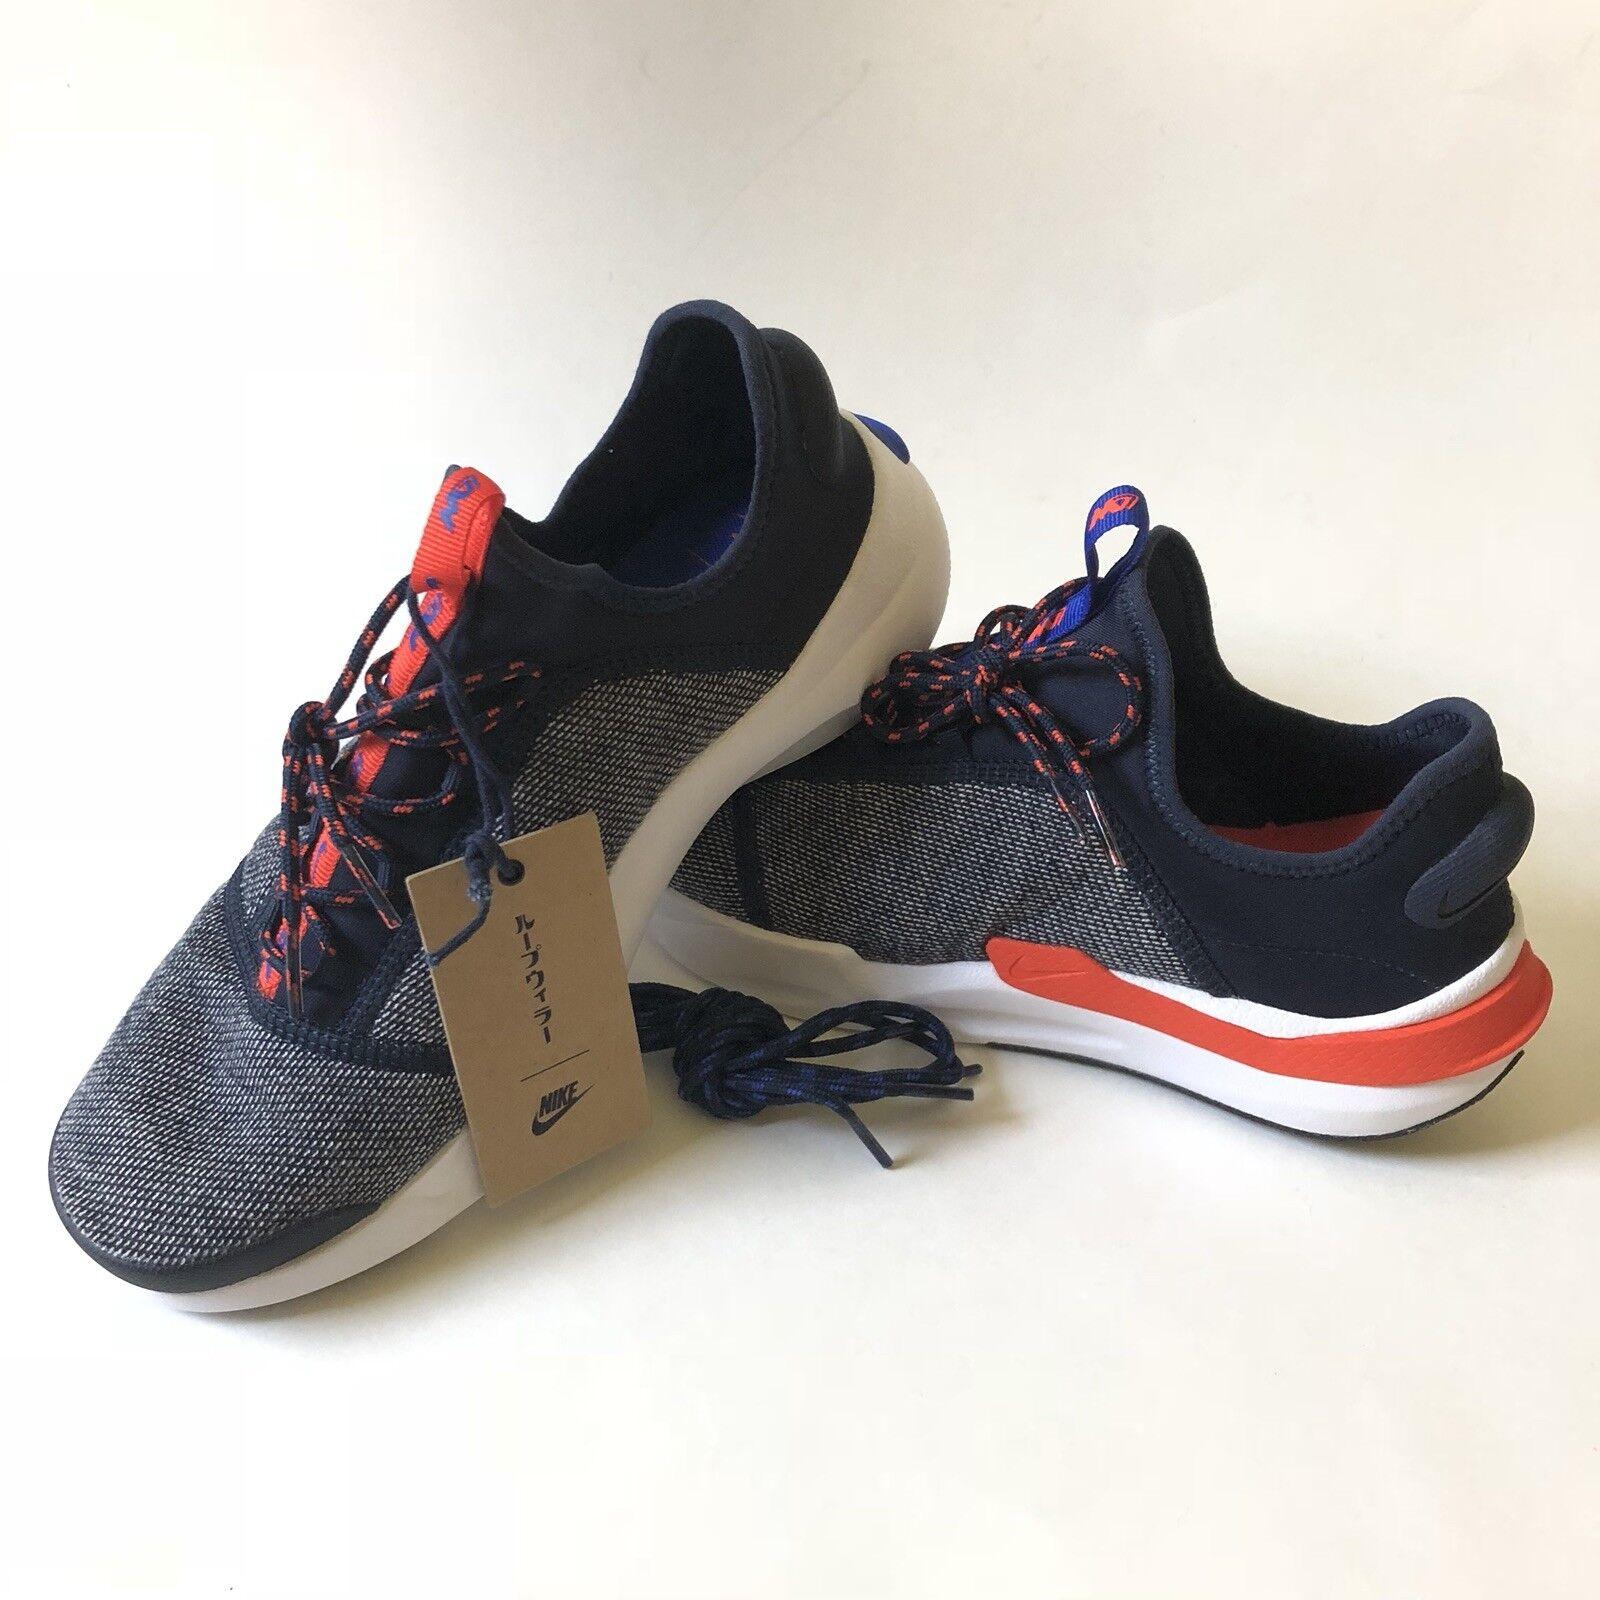 3d1c762a83 Nike Shift One LW Blue AQ2440-400 Sz 8.5 Obsidian/Hyper NEW ...